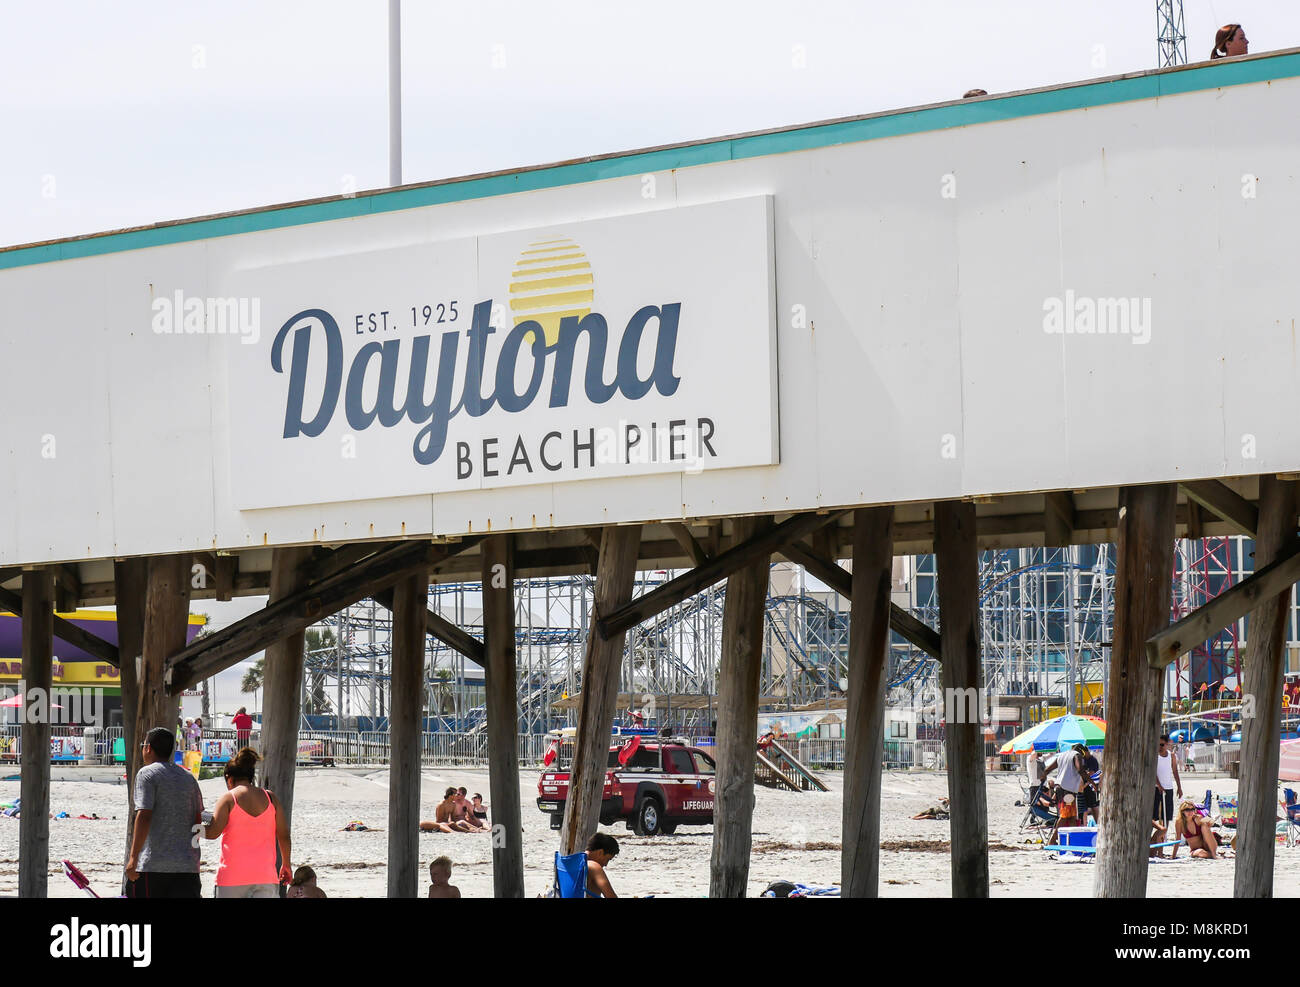 DAYTONA BEACH, FLORIDA - APRIL 15, 2017: The famous historic Daytona Beach Pier is a popular vacation spot to visit Stock Photo